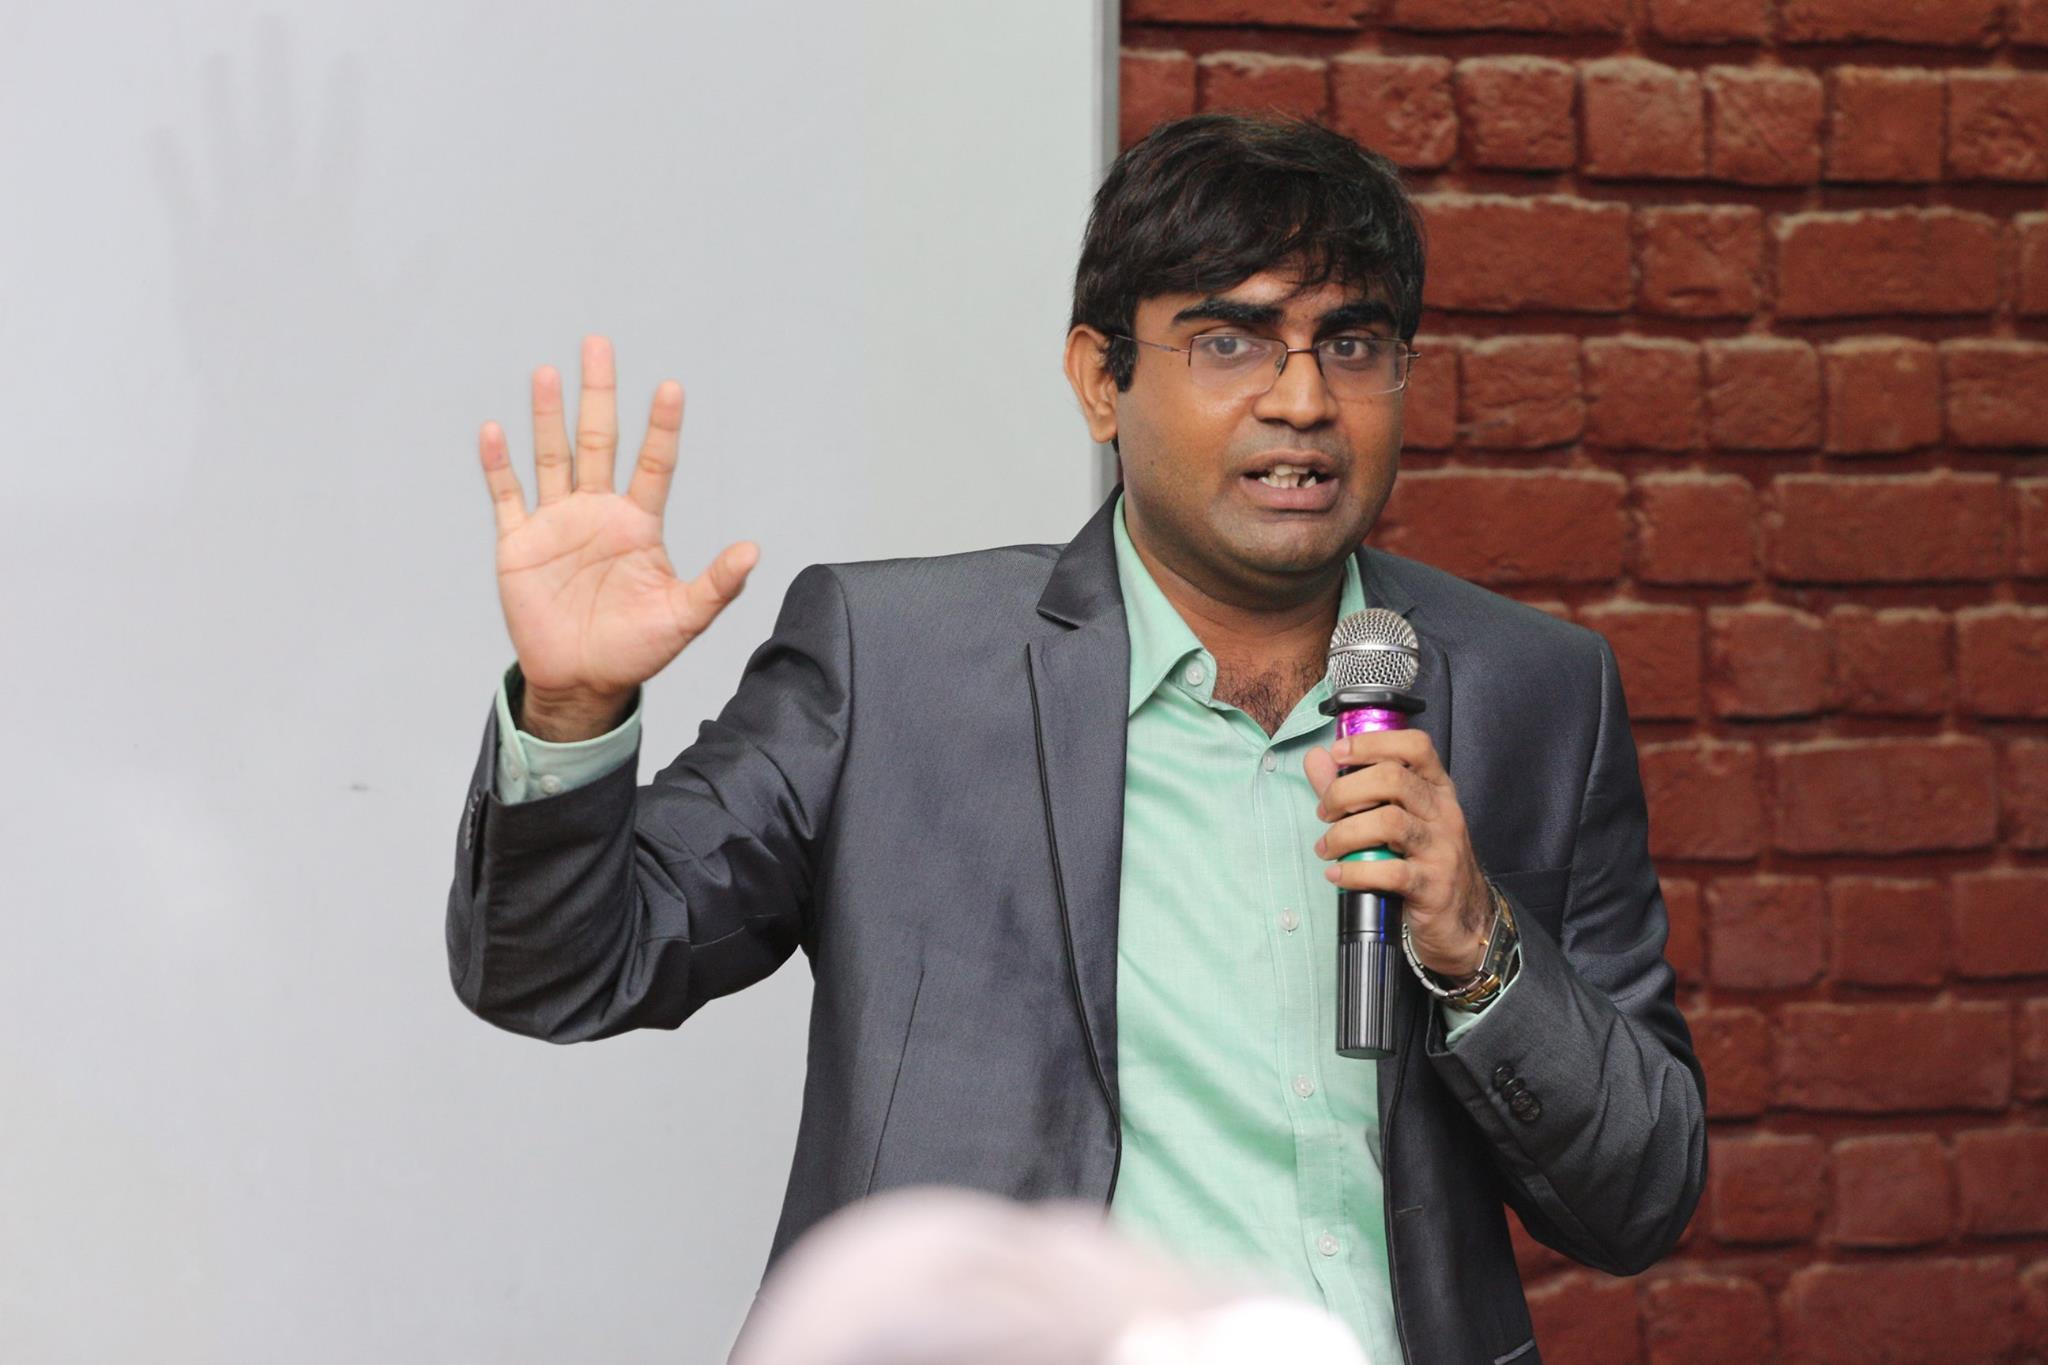 Ashwin Srivastava From Bihar made it to Forbes 30 under 30 Asia 2017 list of Entrepreneurs